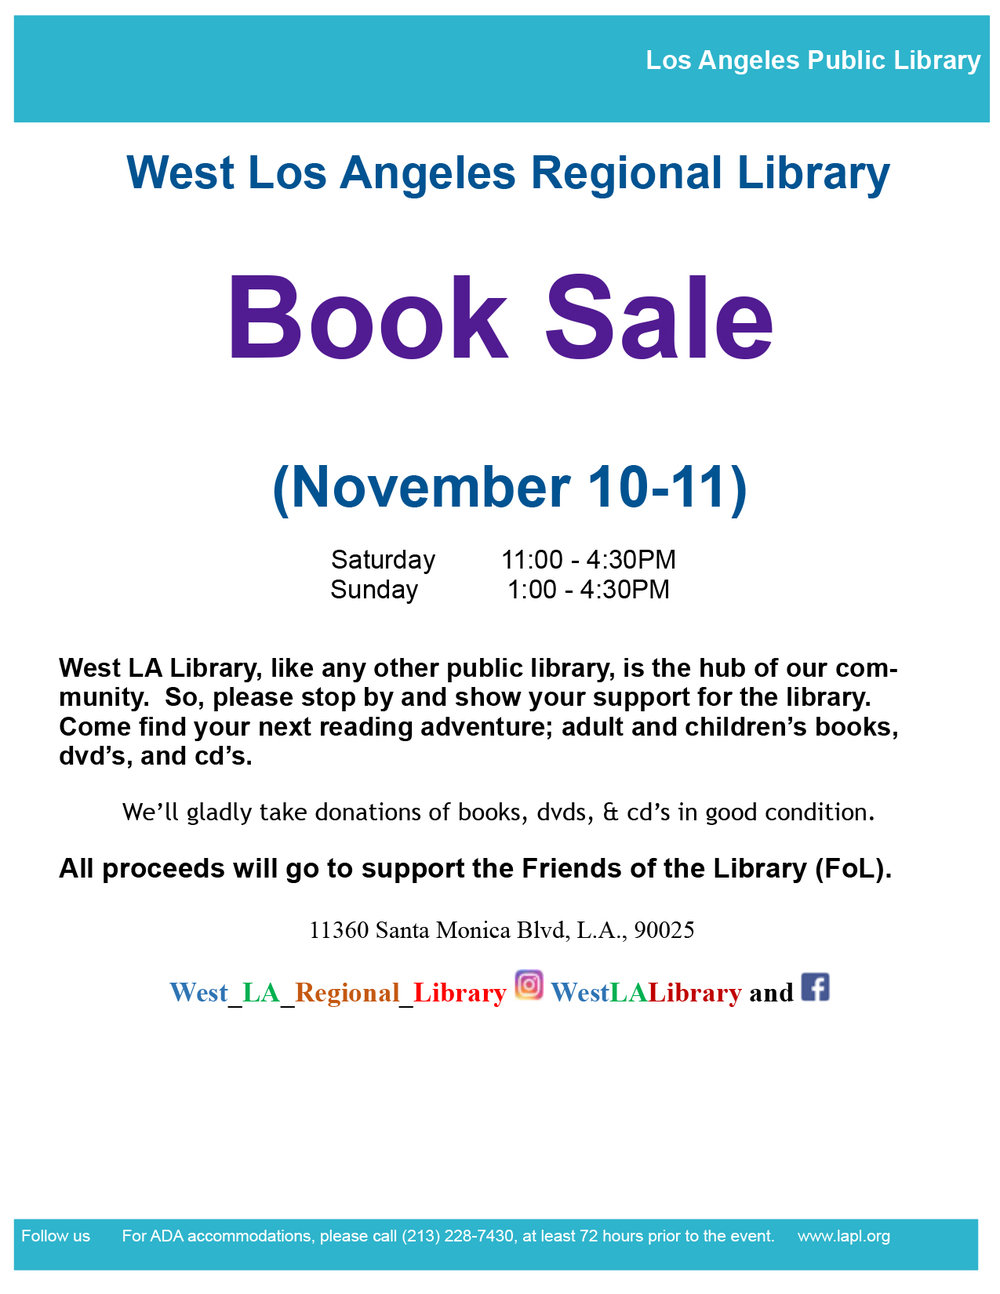 WLAL_BookSale_Nov18wf.jpg